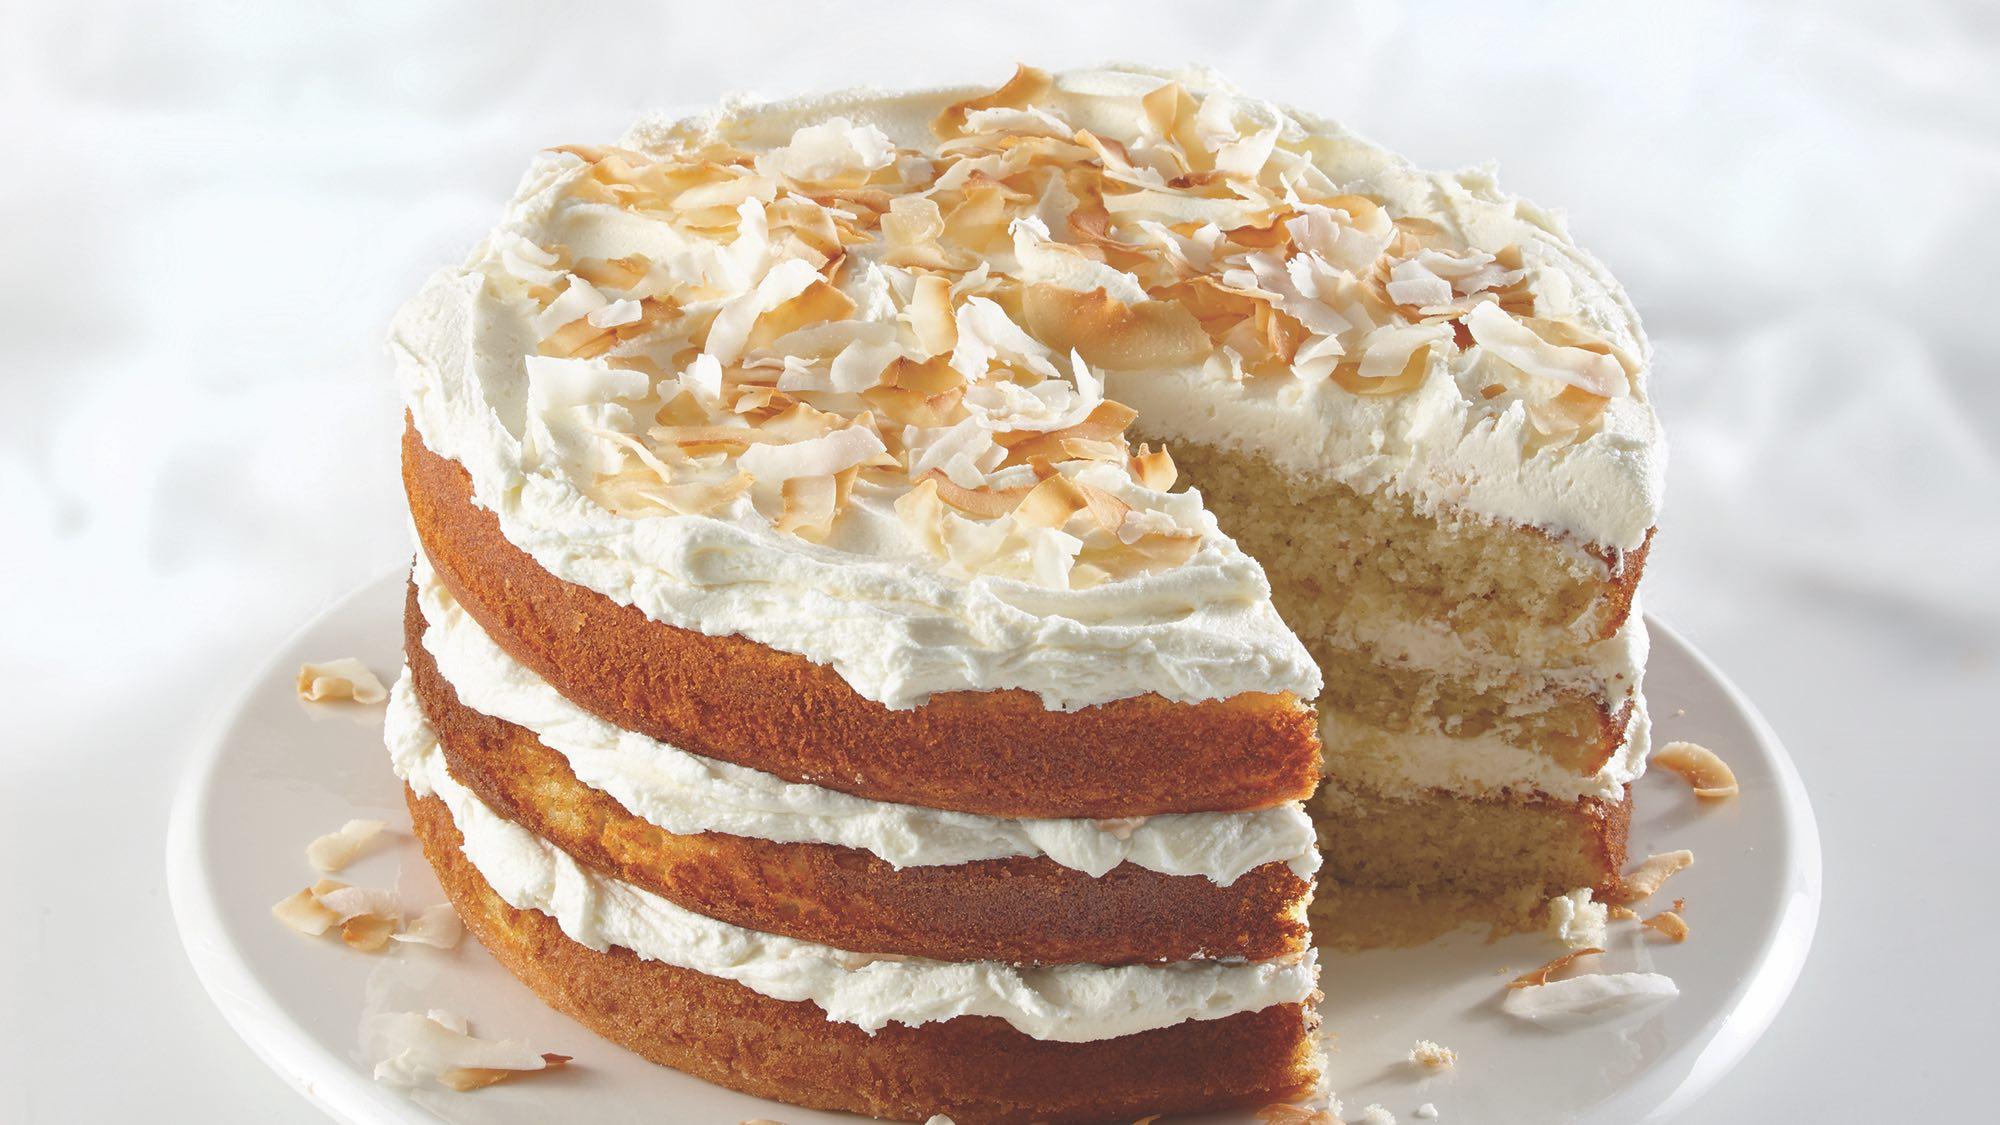 McCormick Ultimate Coconut Cake